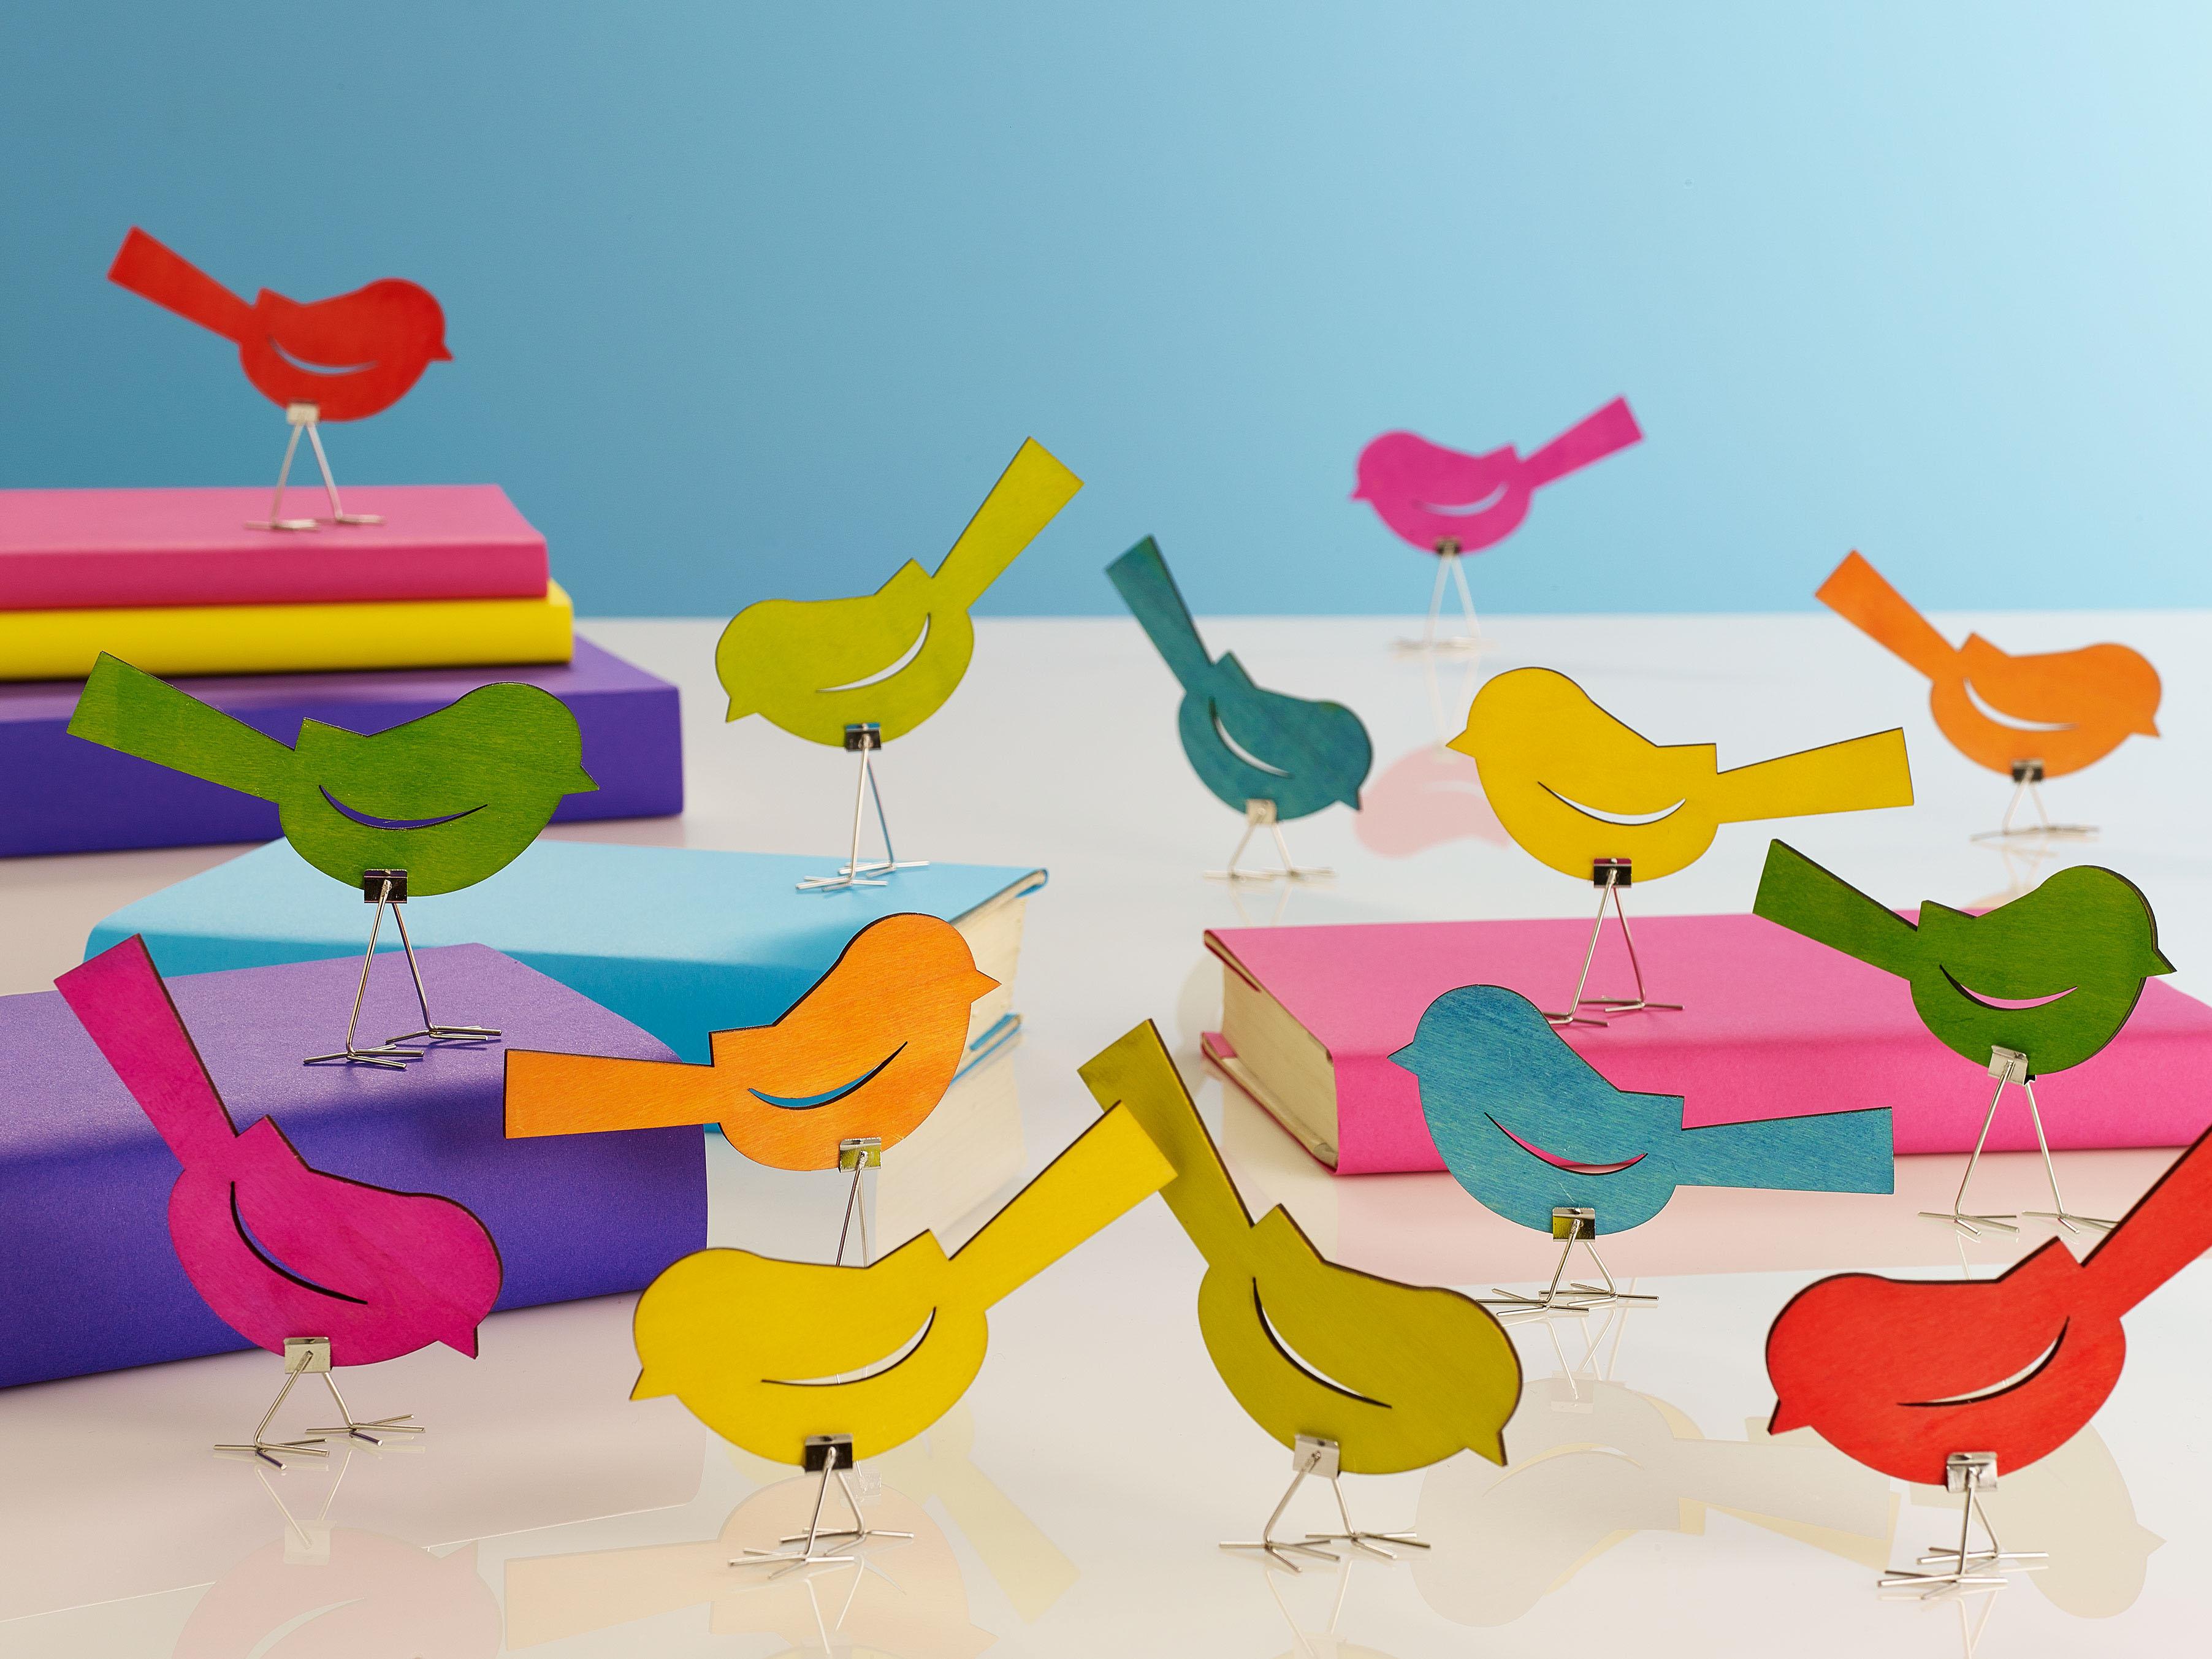 Design ideas ltd springfield il - Chirp Decoration For Design Ideas Ltd